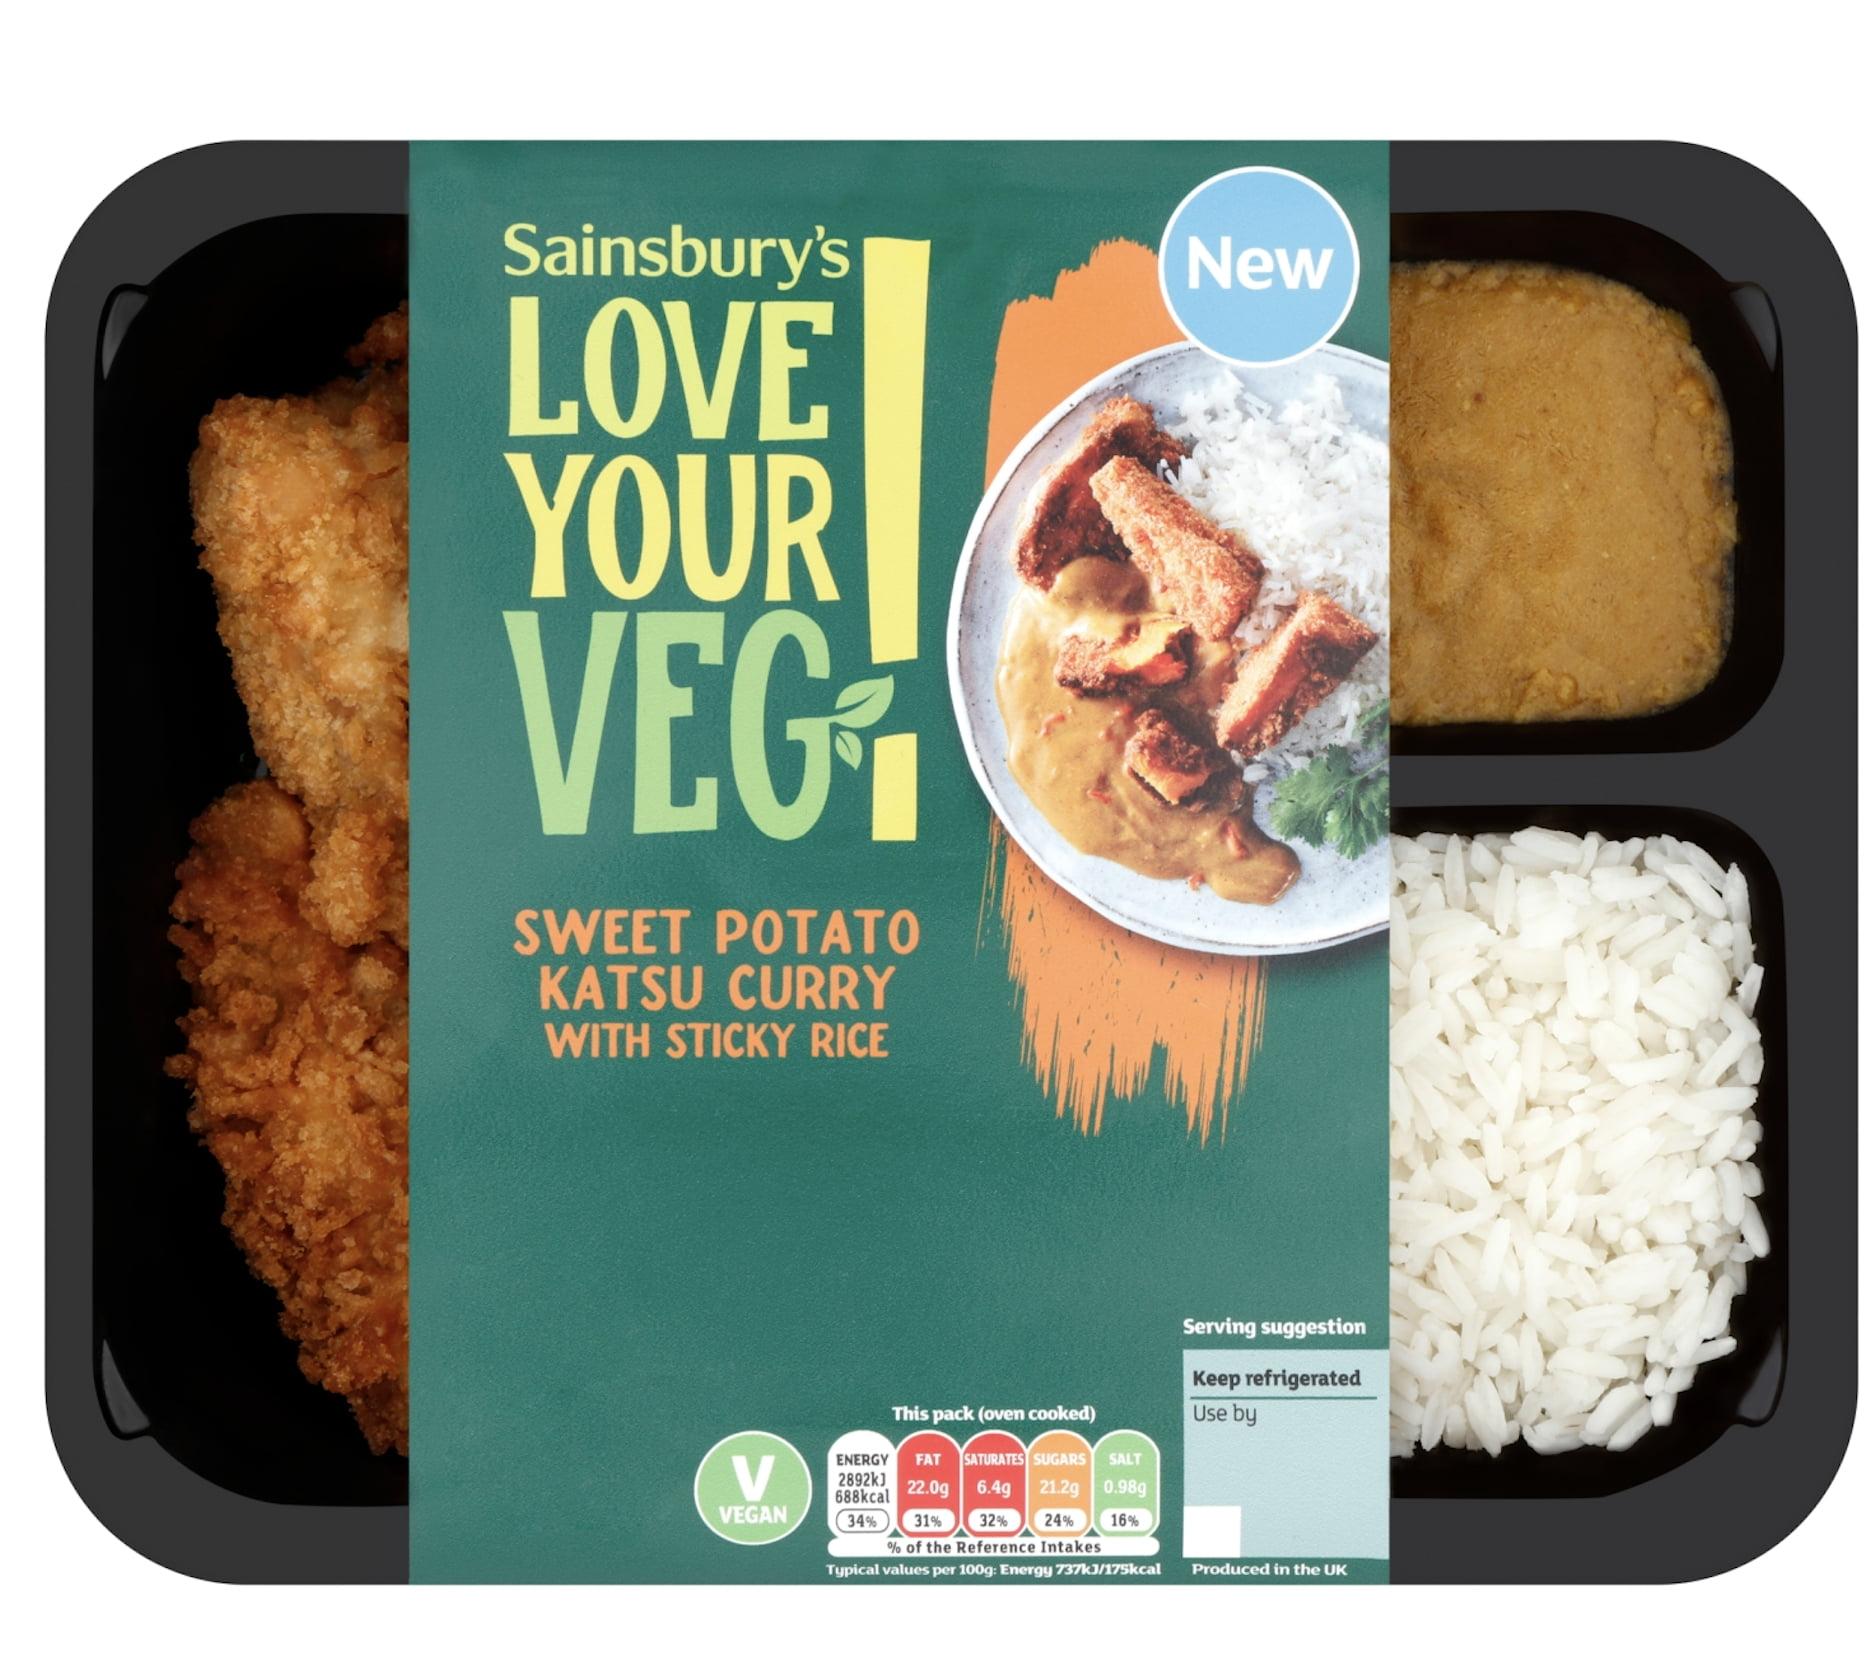 Sainsbury's Love Your Veg Katsu Cury